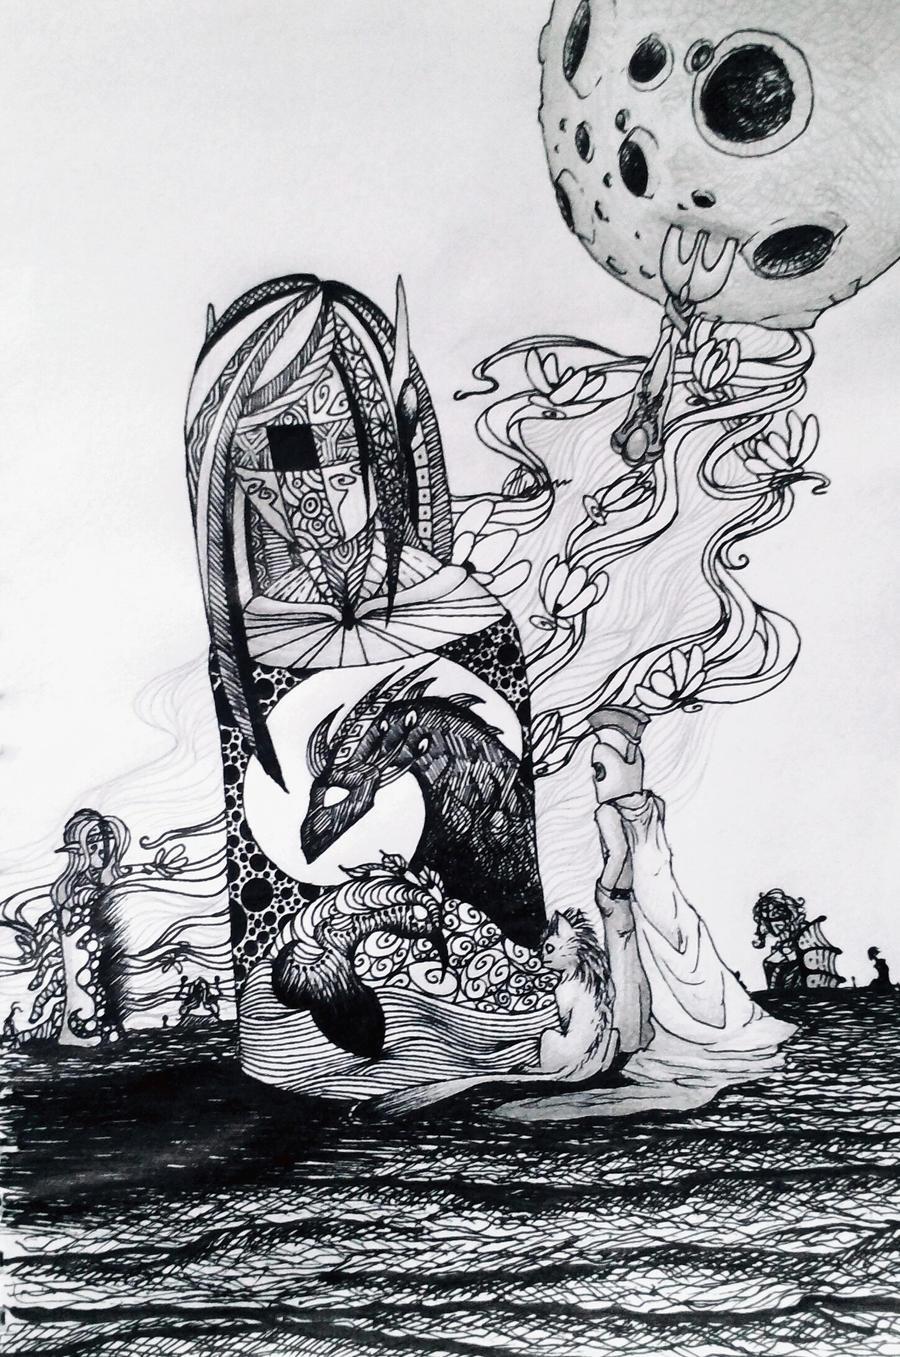 Monolith by Azurushka